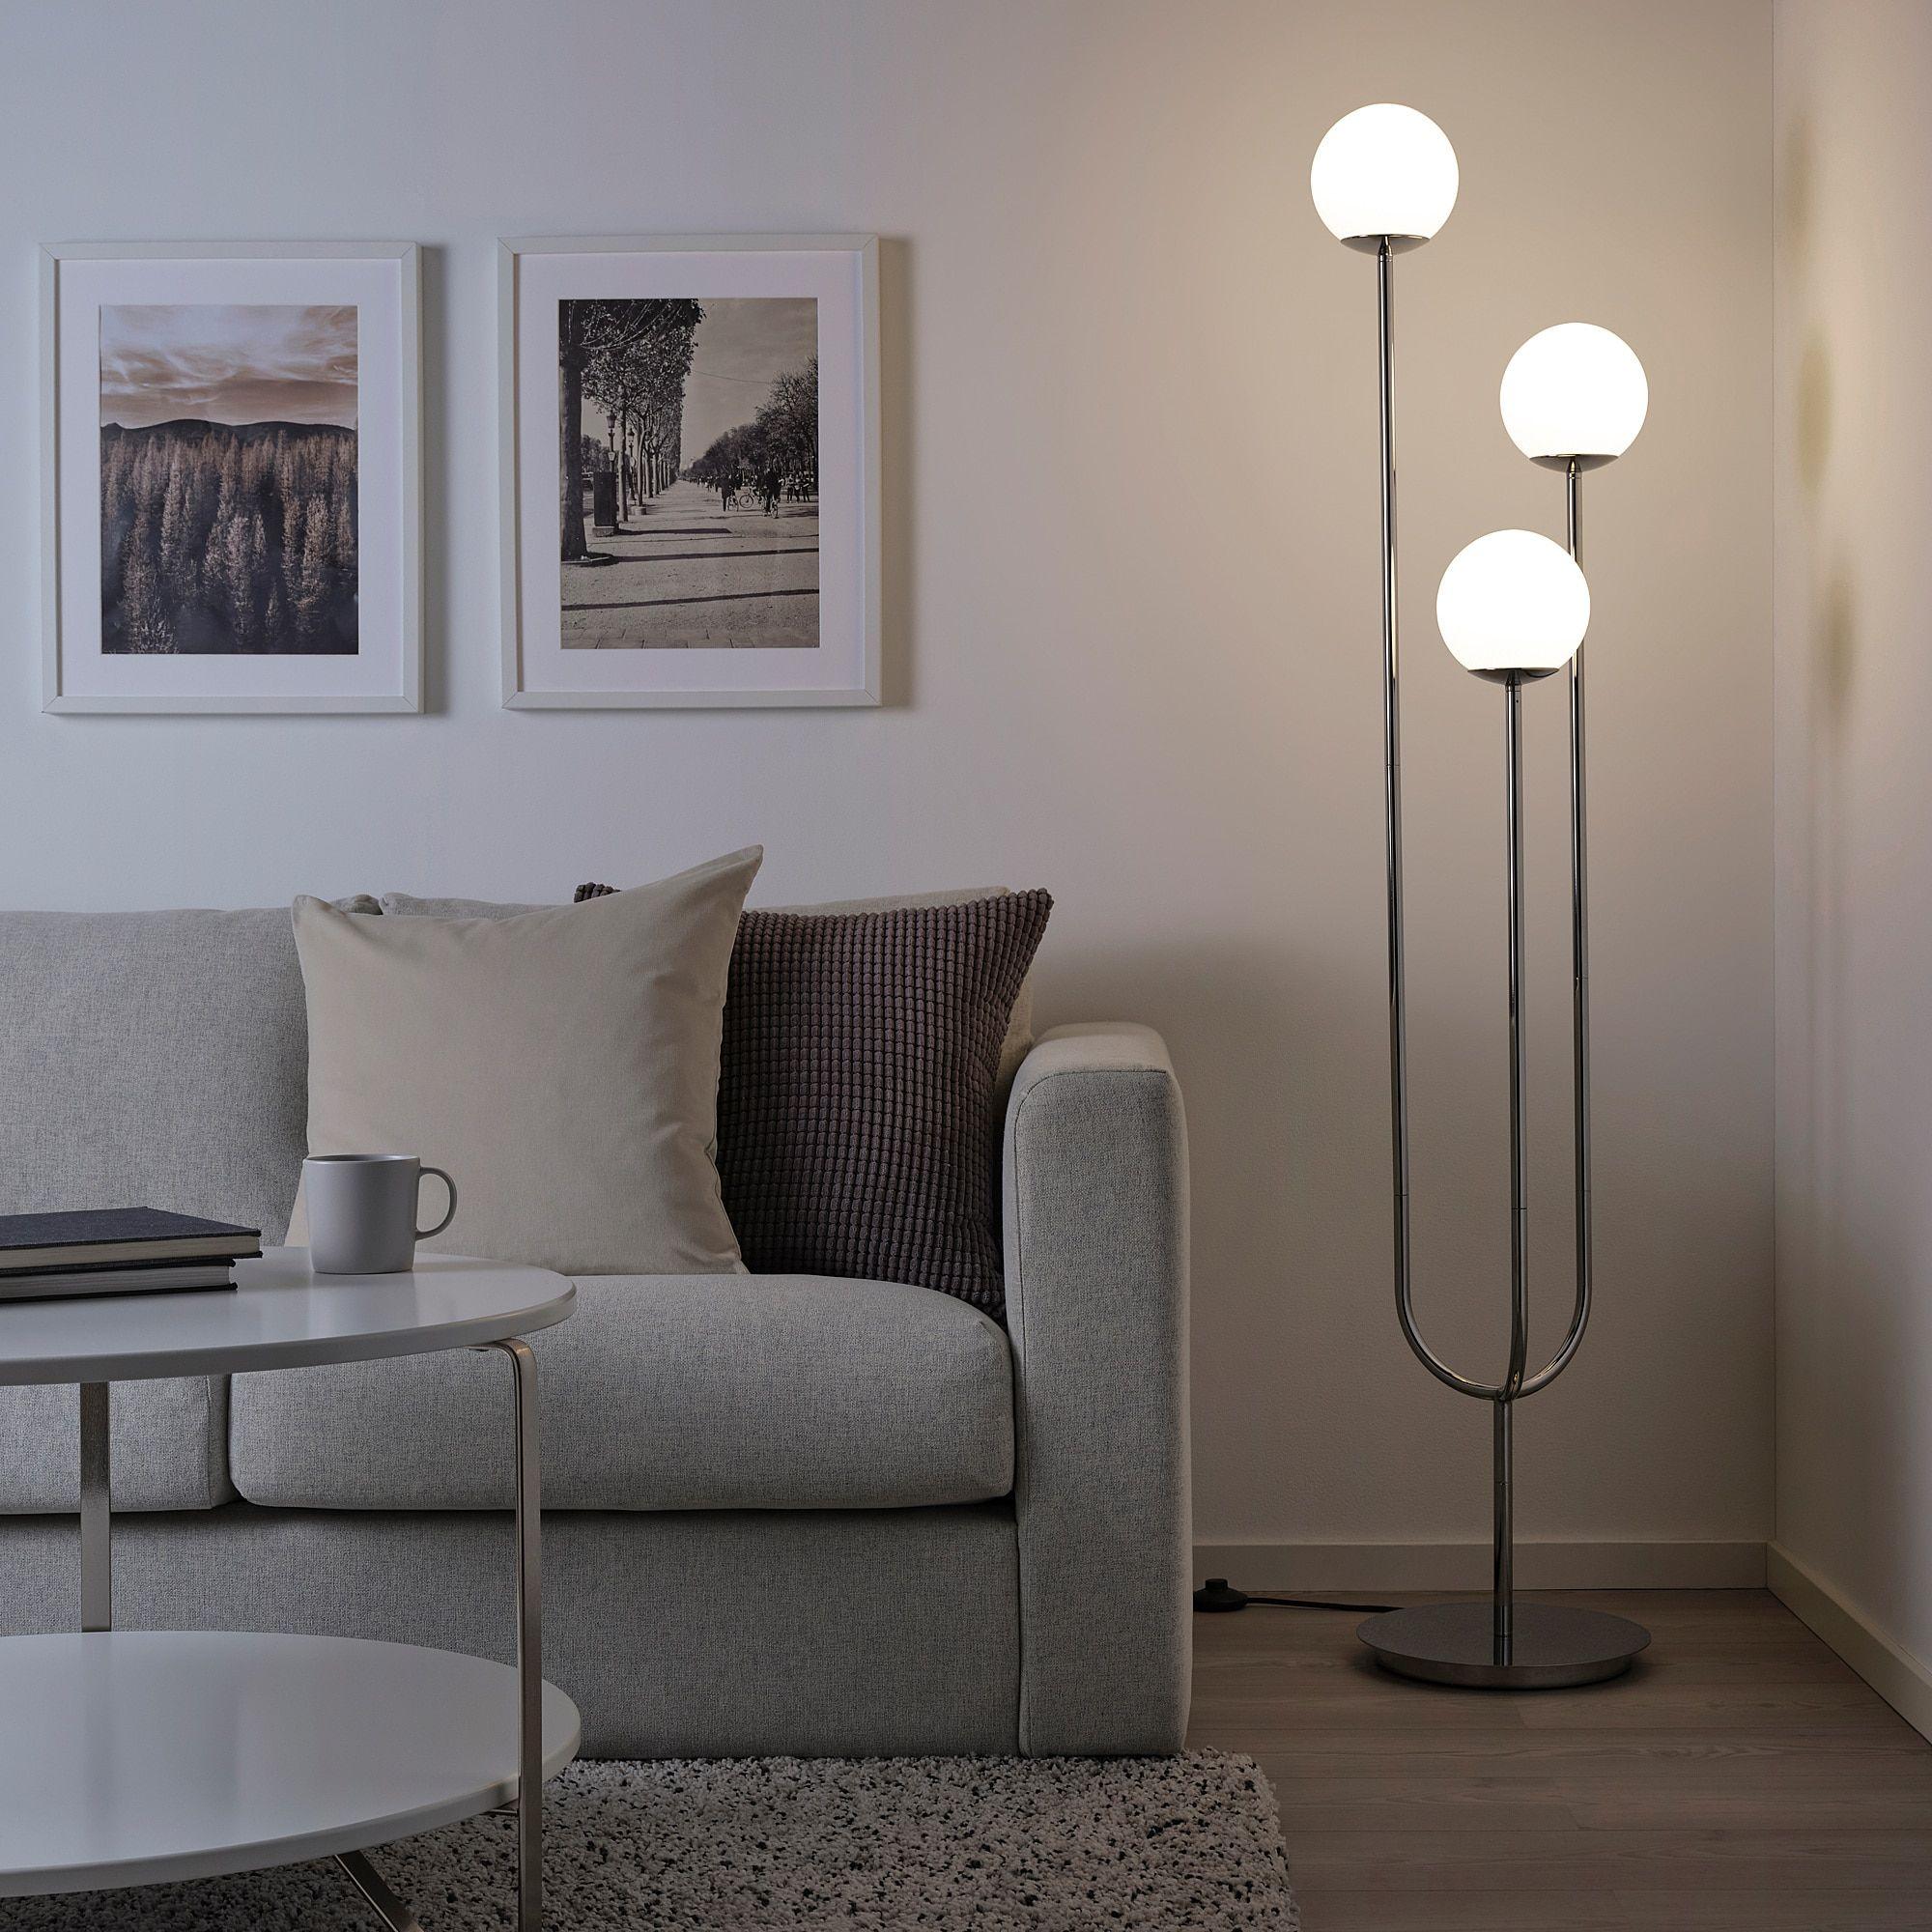 Simrishamn Floor Lamp With Led Bulb Chrome Plated Opal Glass Ikea Ikea Floor Lamp Ikea Light Led Floor Lamp